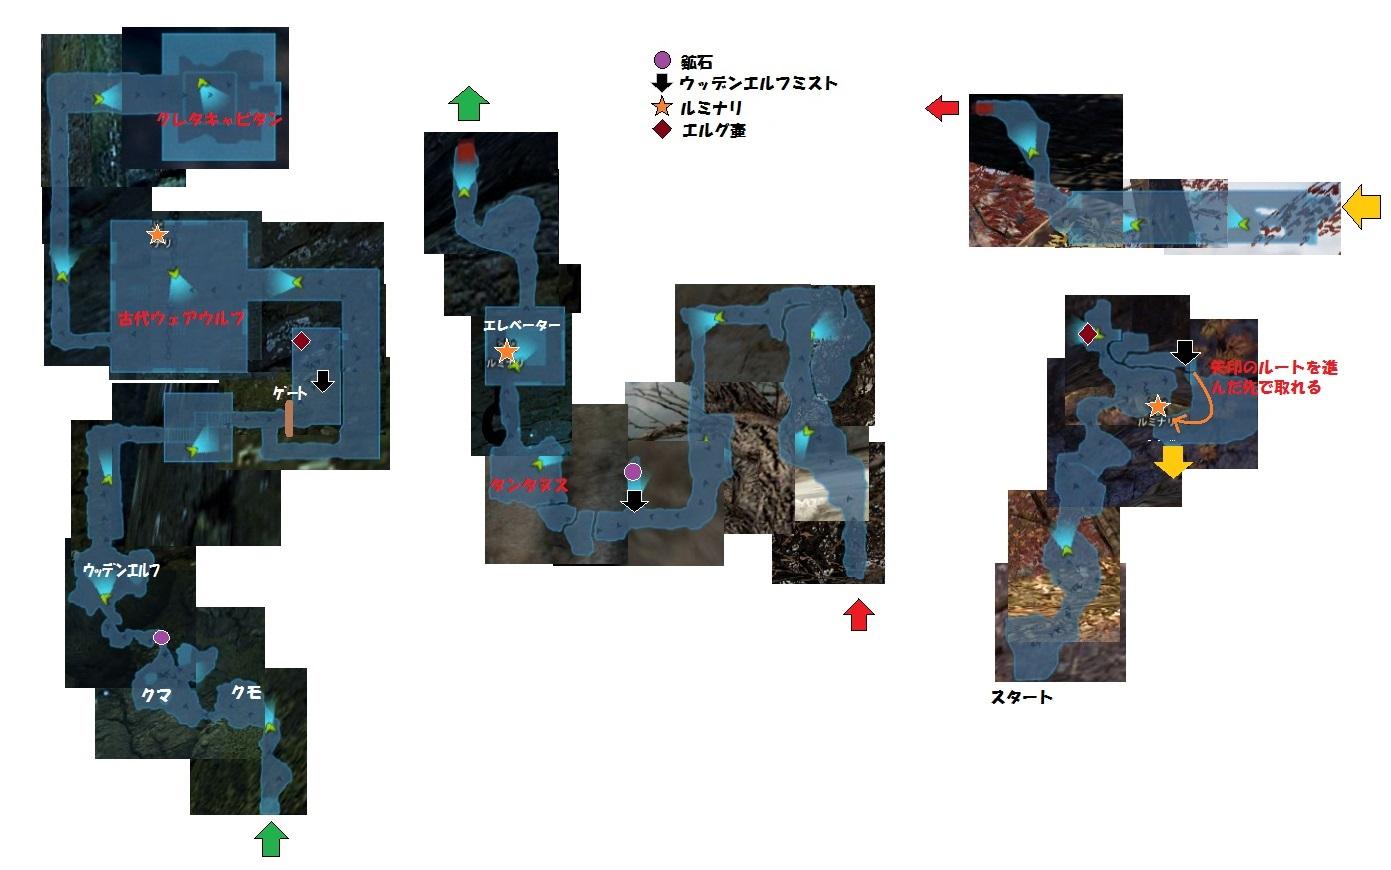 map_ベン・チェナー頂上2.jpg